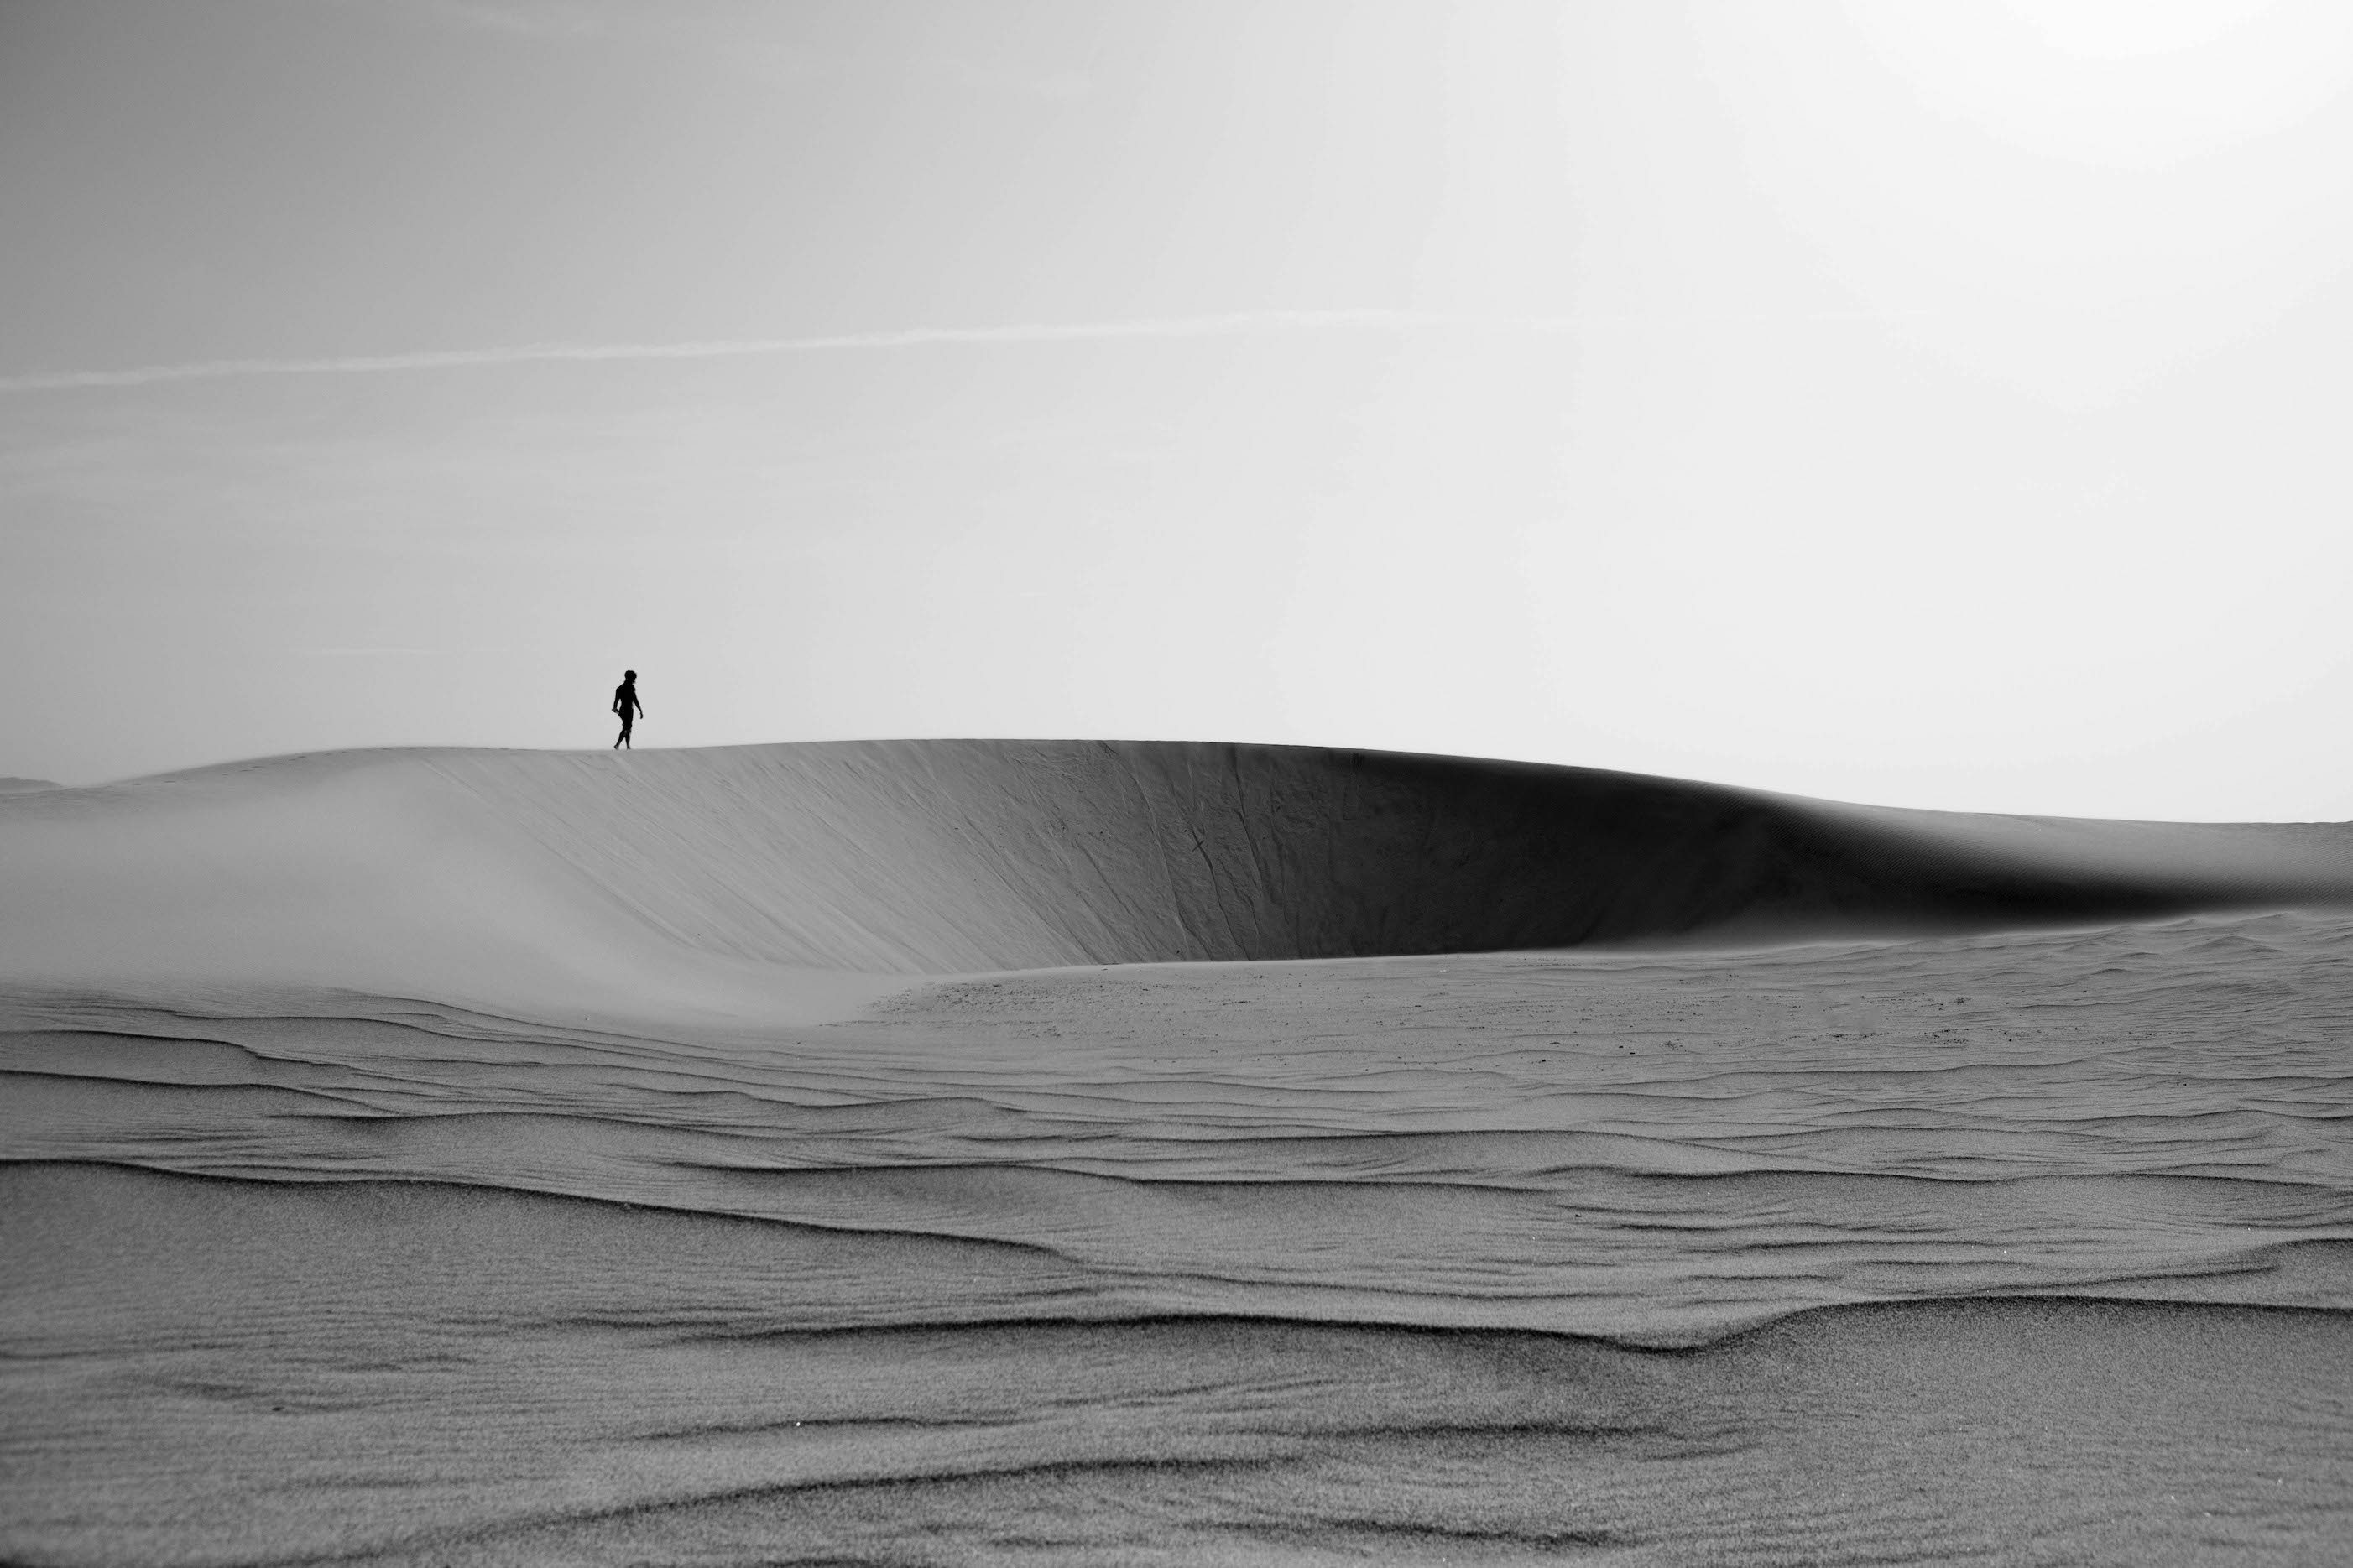 Nick White Photography